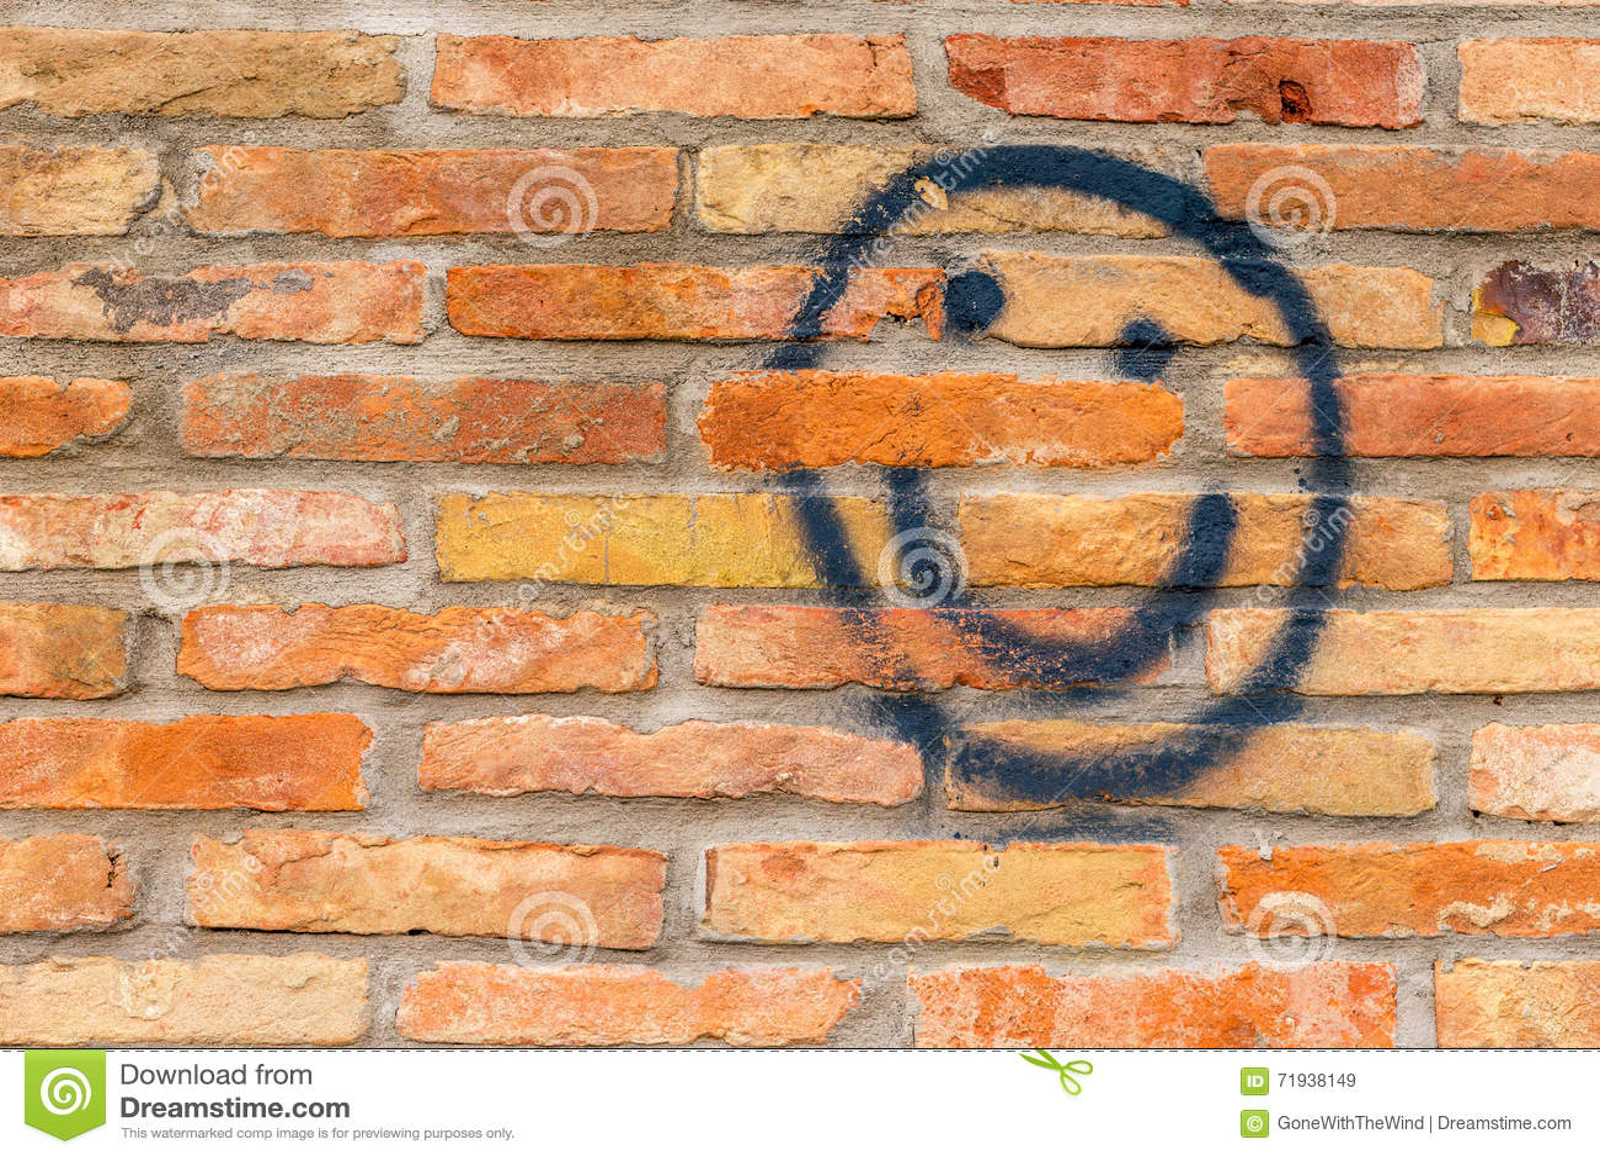 Сторона Smiley нарисованная на стене